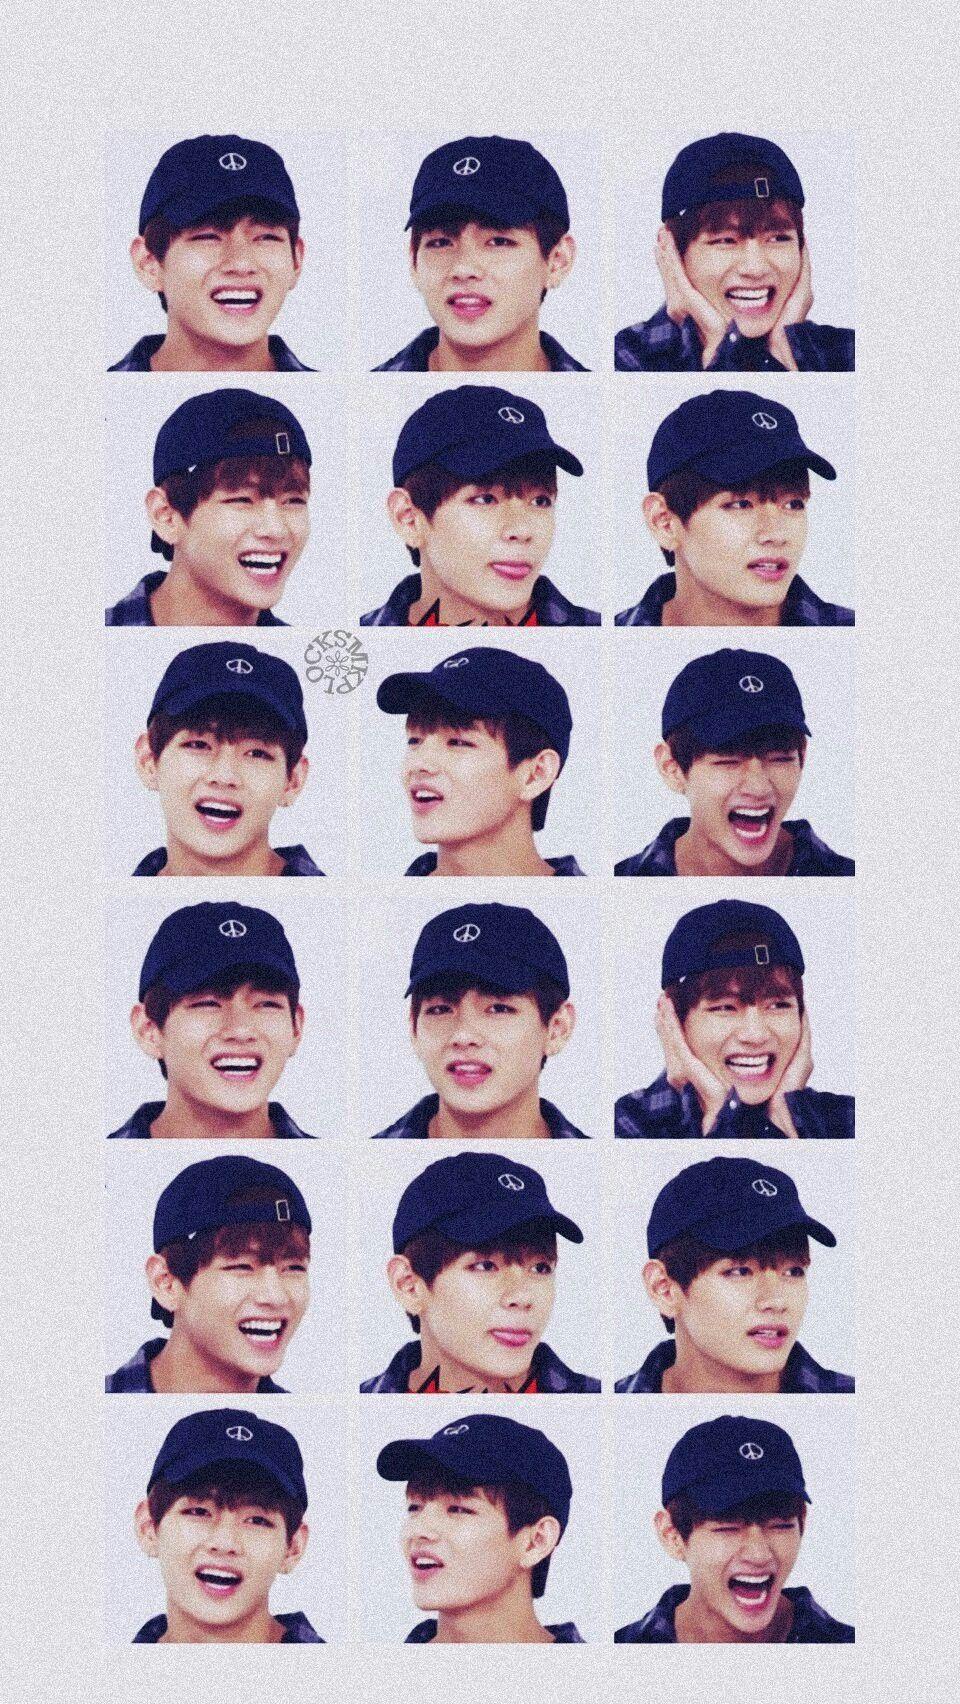 Taehyung V Wallpaper Kim Taehyung Kim Seokjin Jimin Wallpaper wa bts v